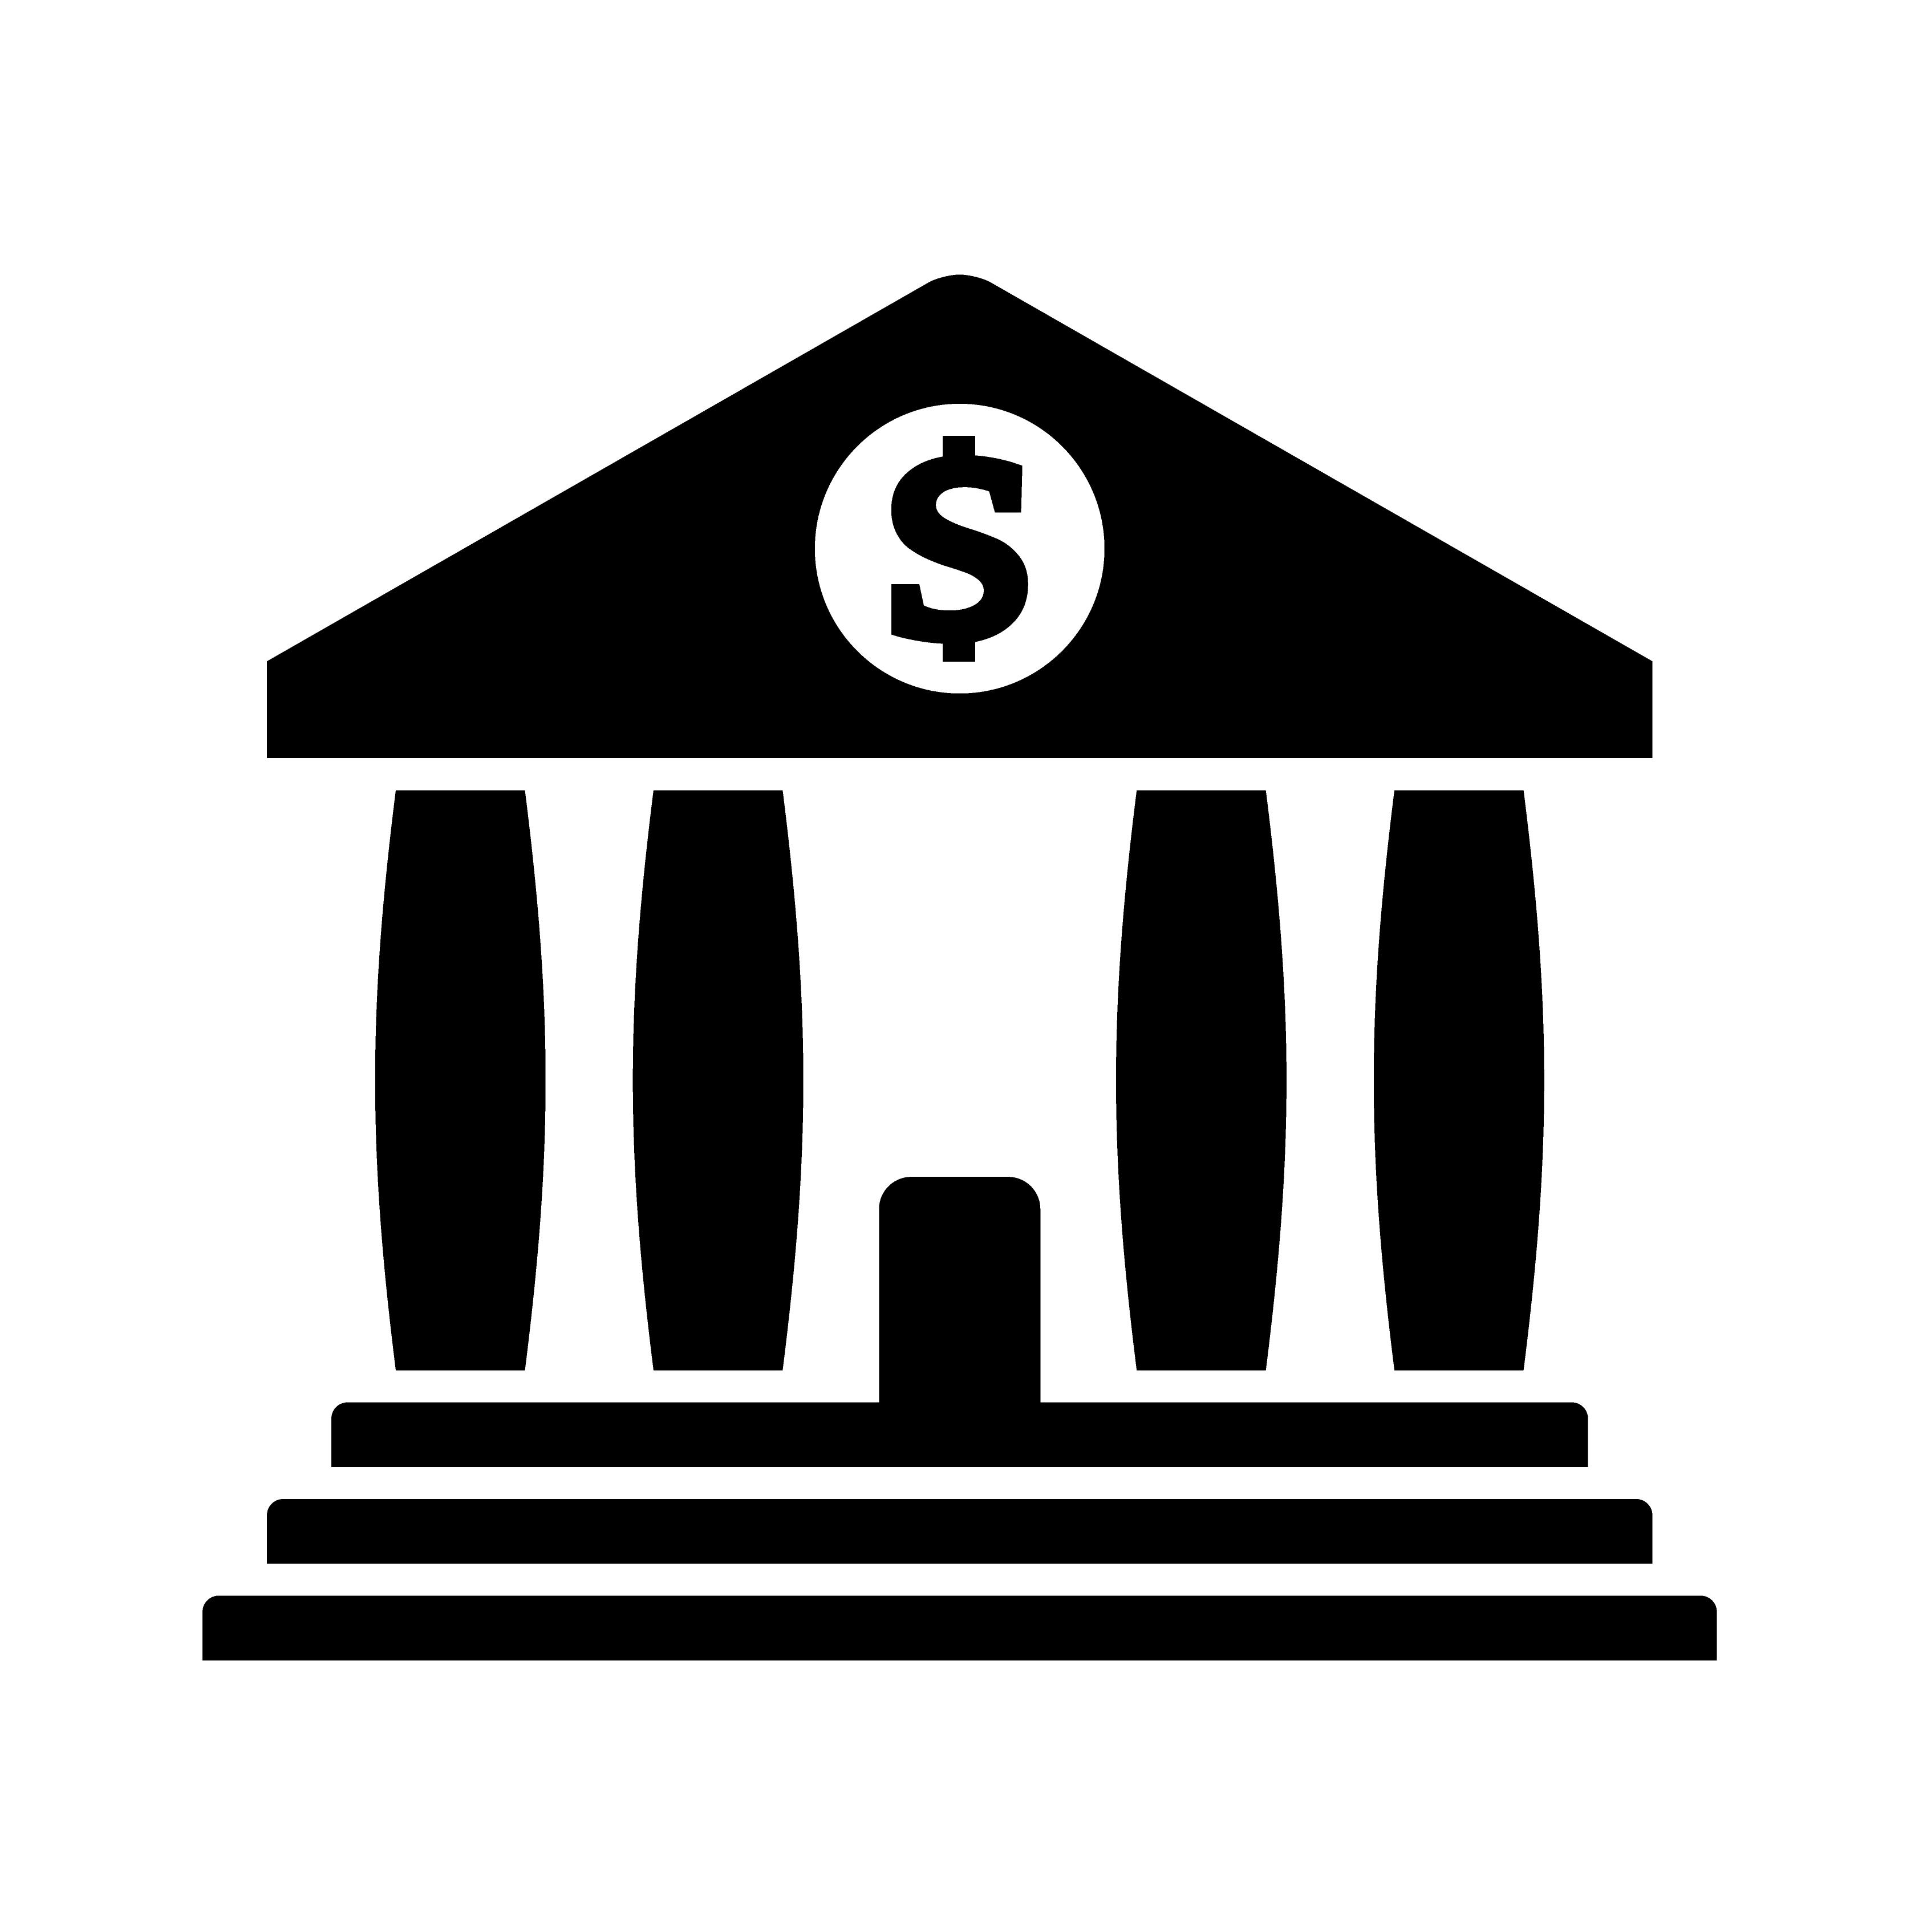 Financial_Services_Icon.jpg